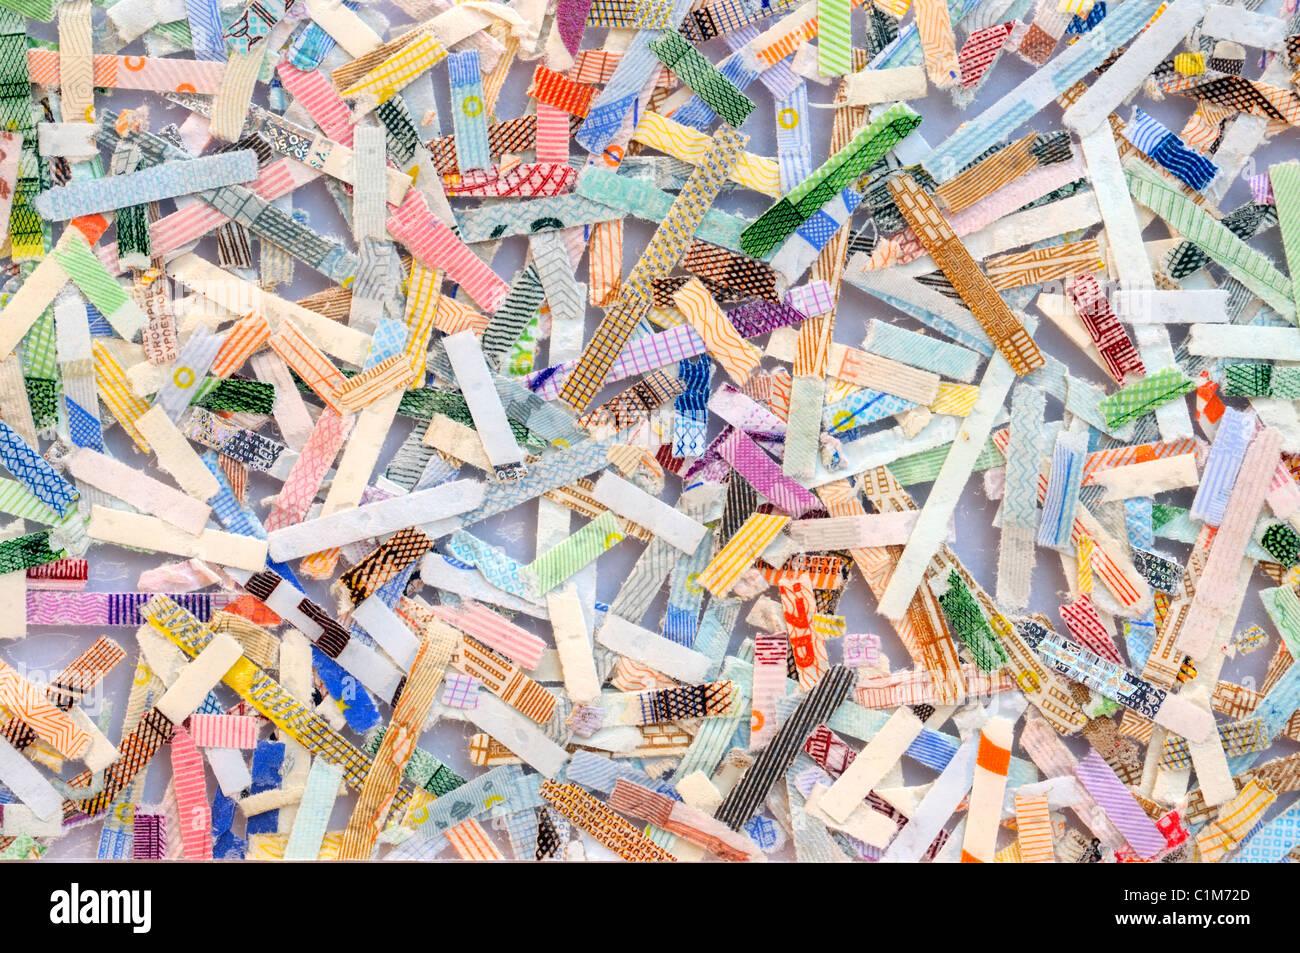 Shredded Euro Banknotes. - Stock Image